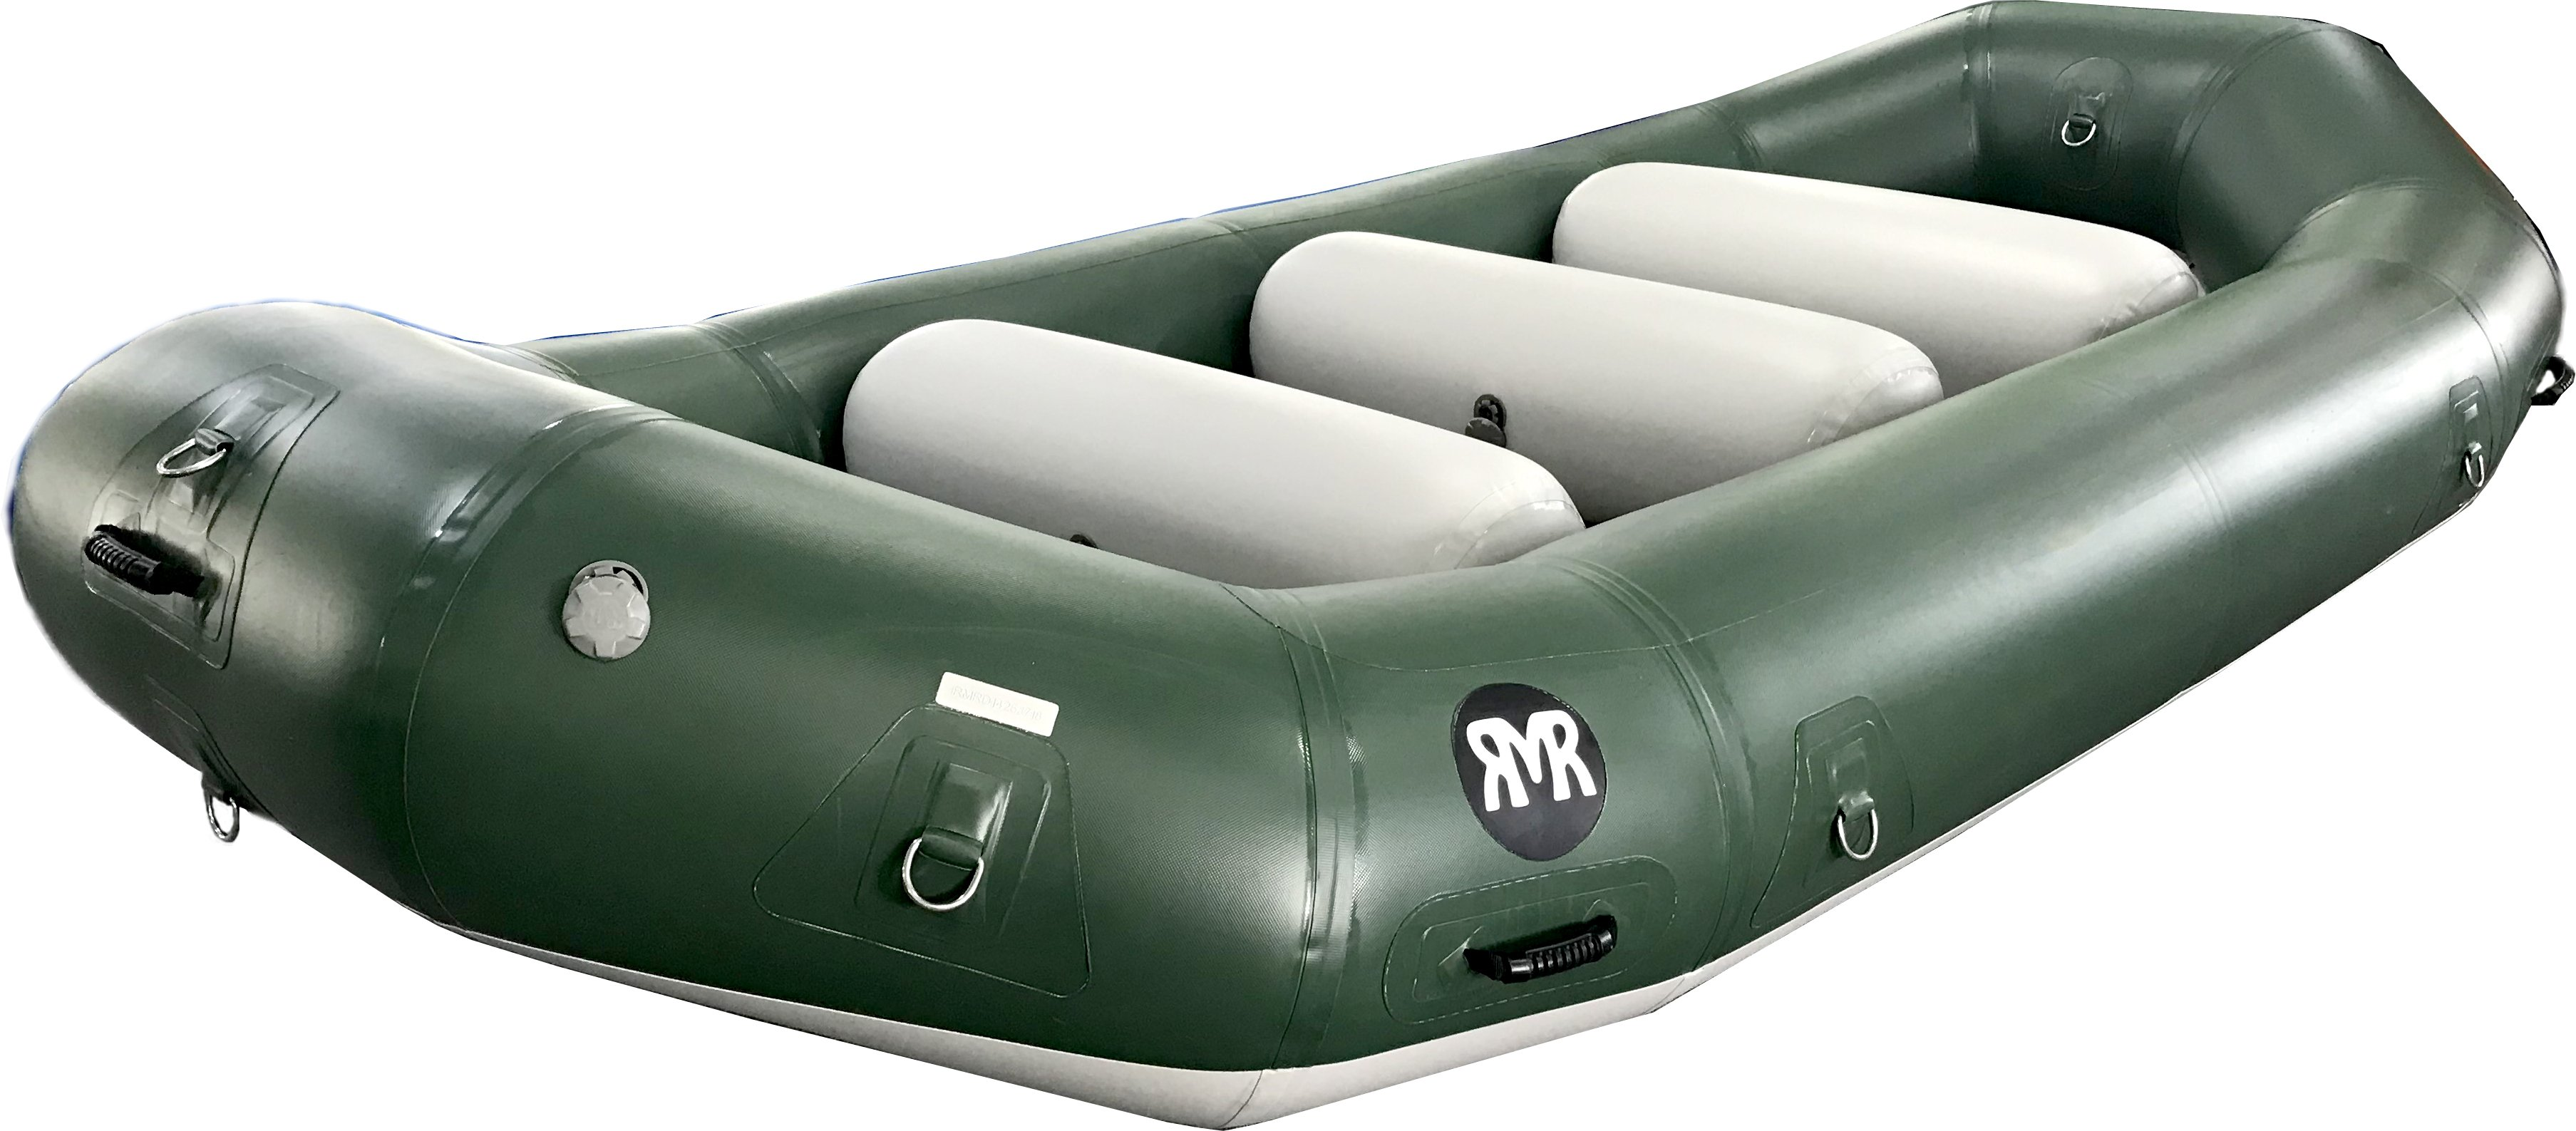 Rocky Mountain Raft 14' Self Bailing Raft | Products